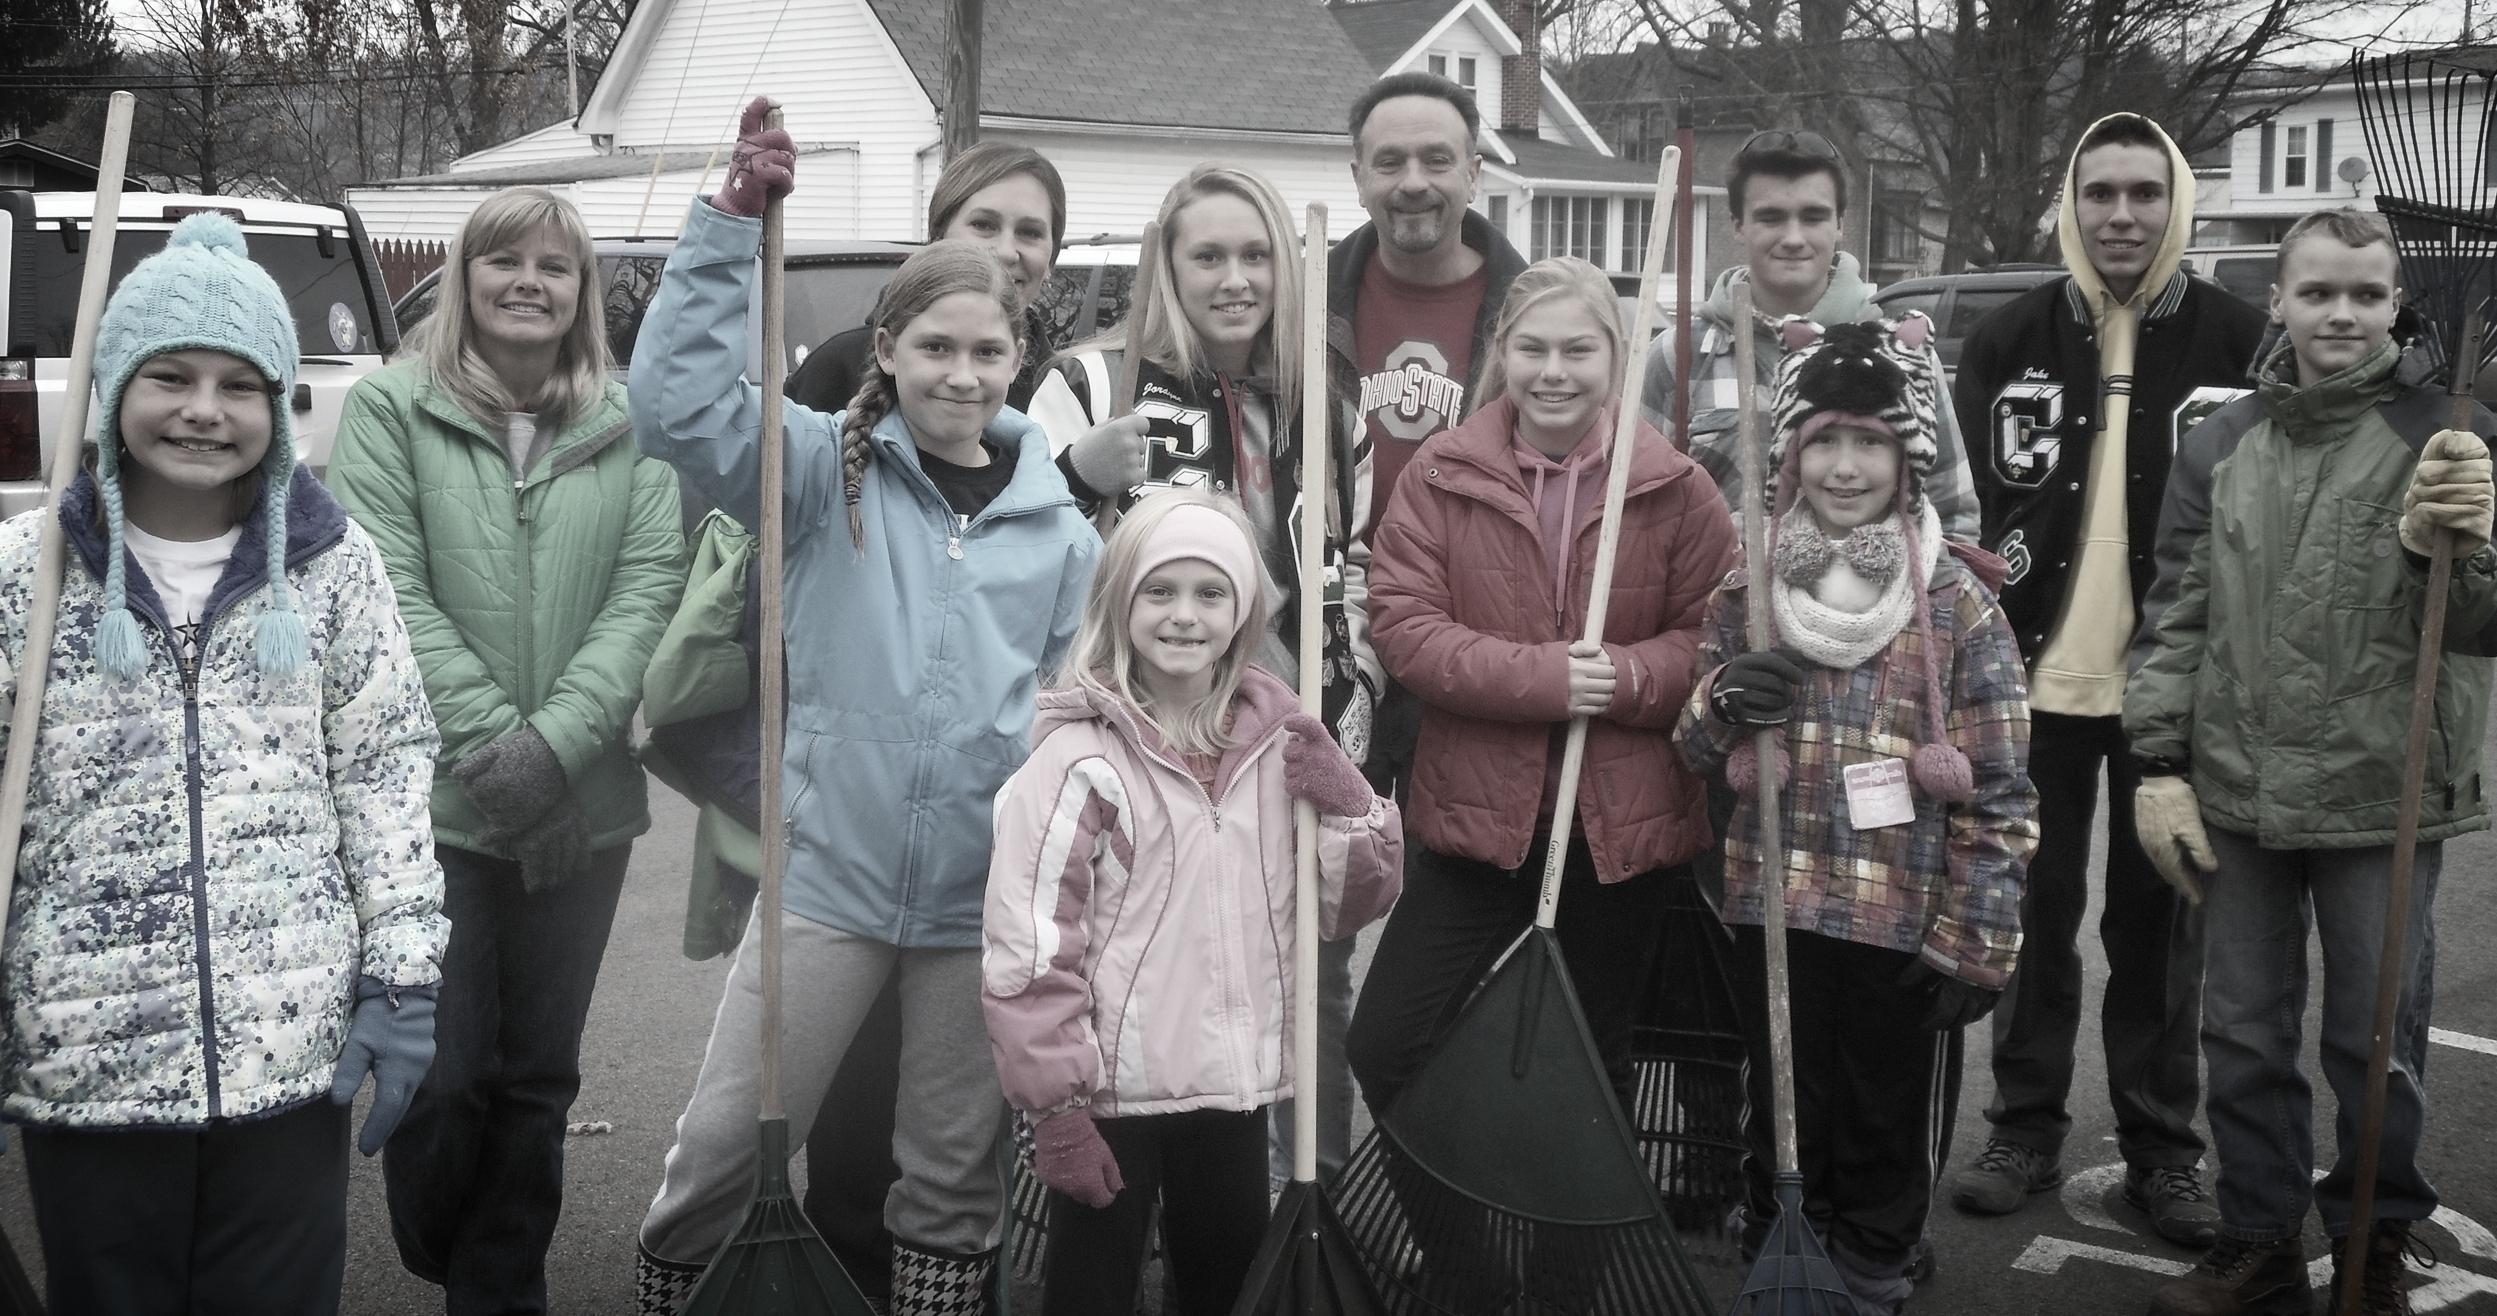 Neighborhood leaf-raking by the youth of Saint Paul Lutheran Church